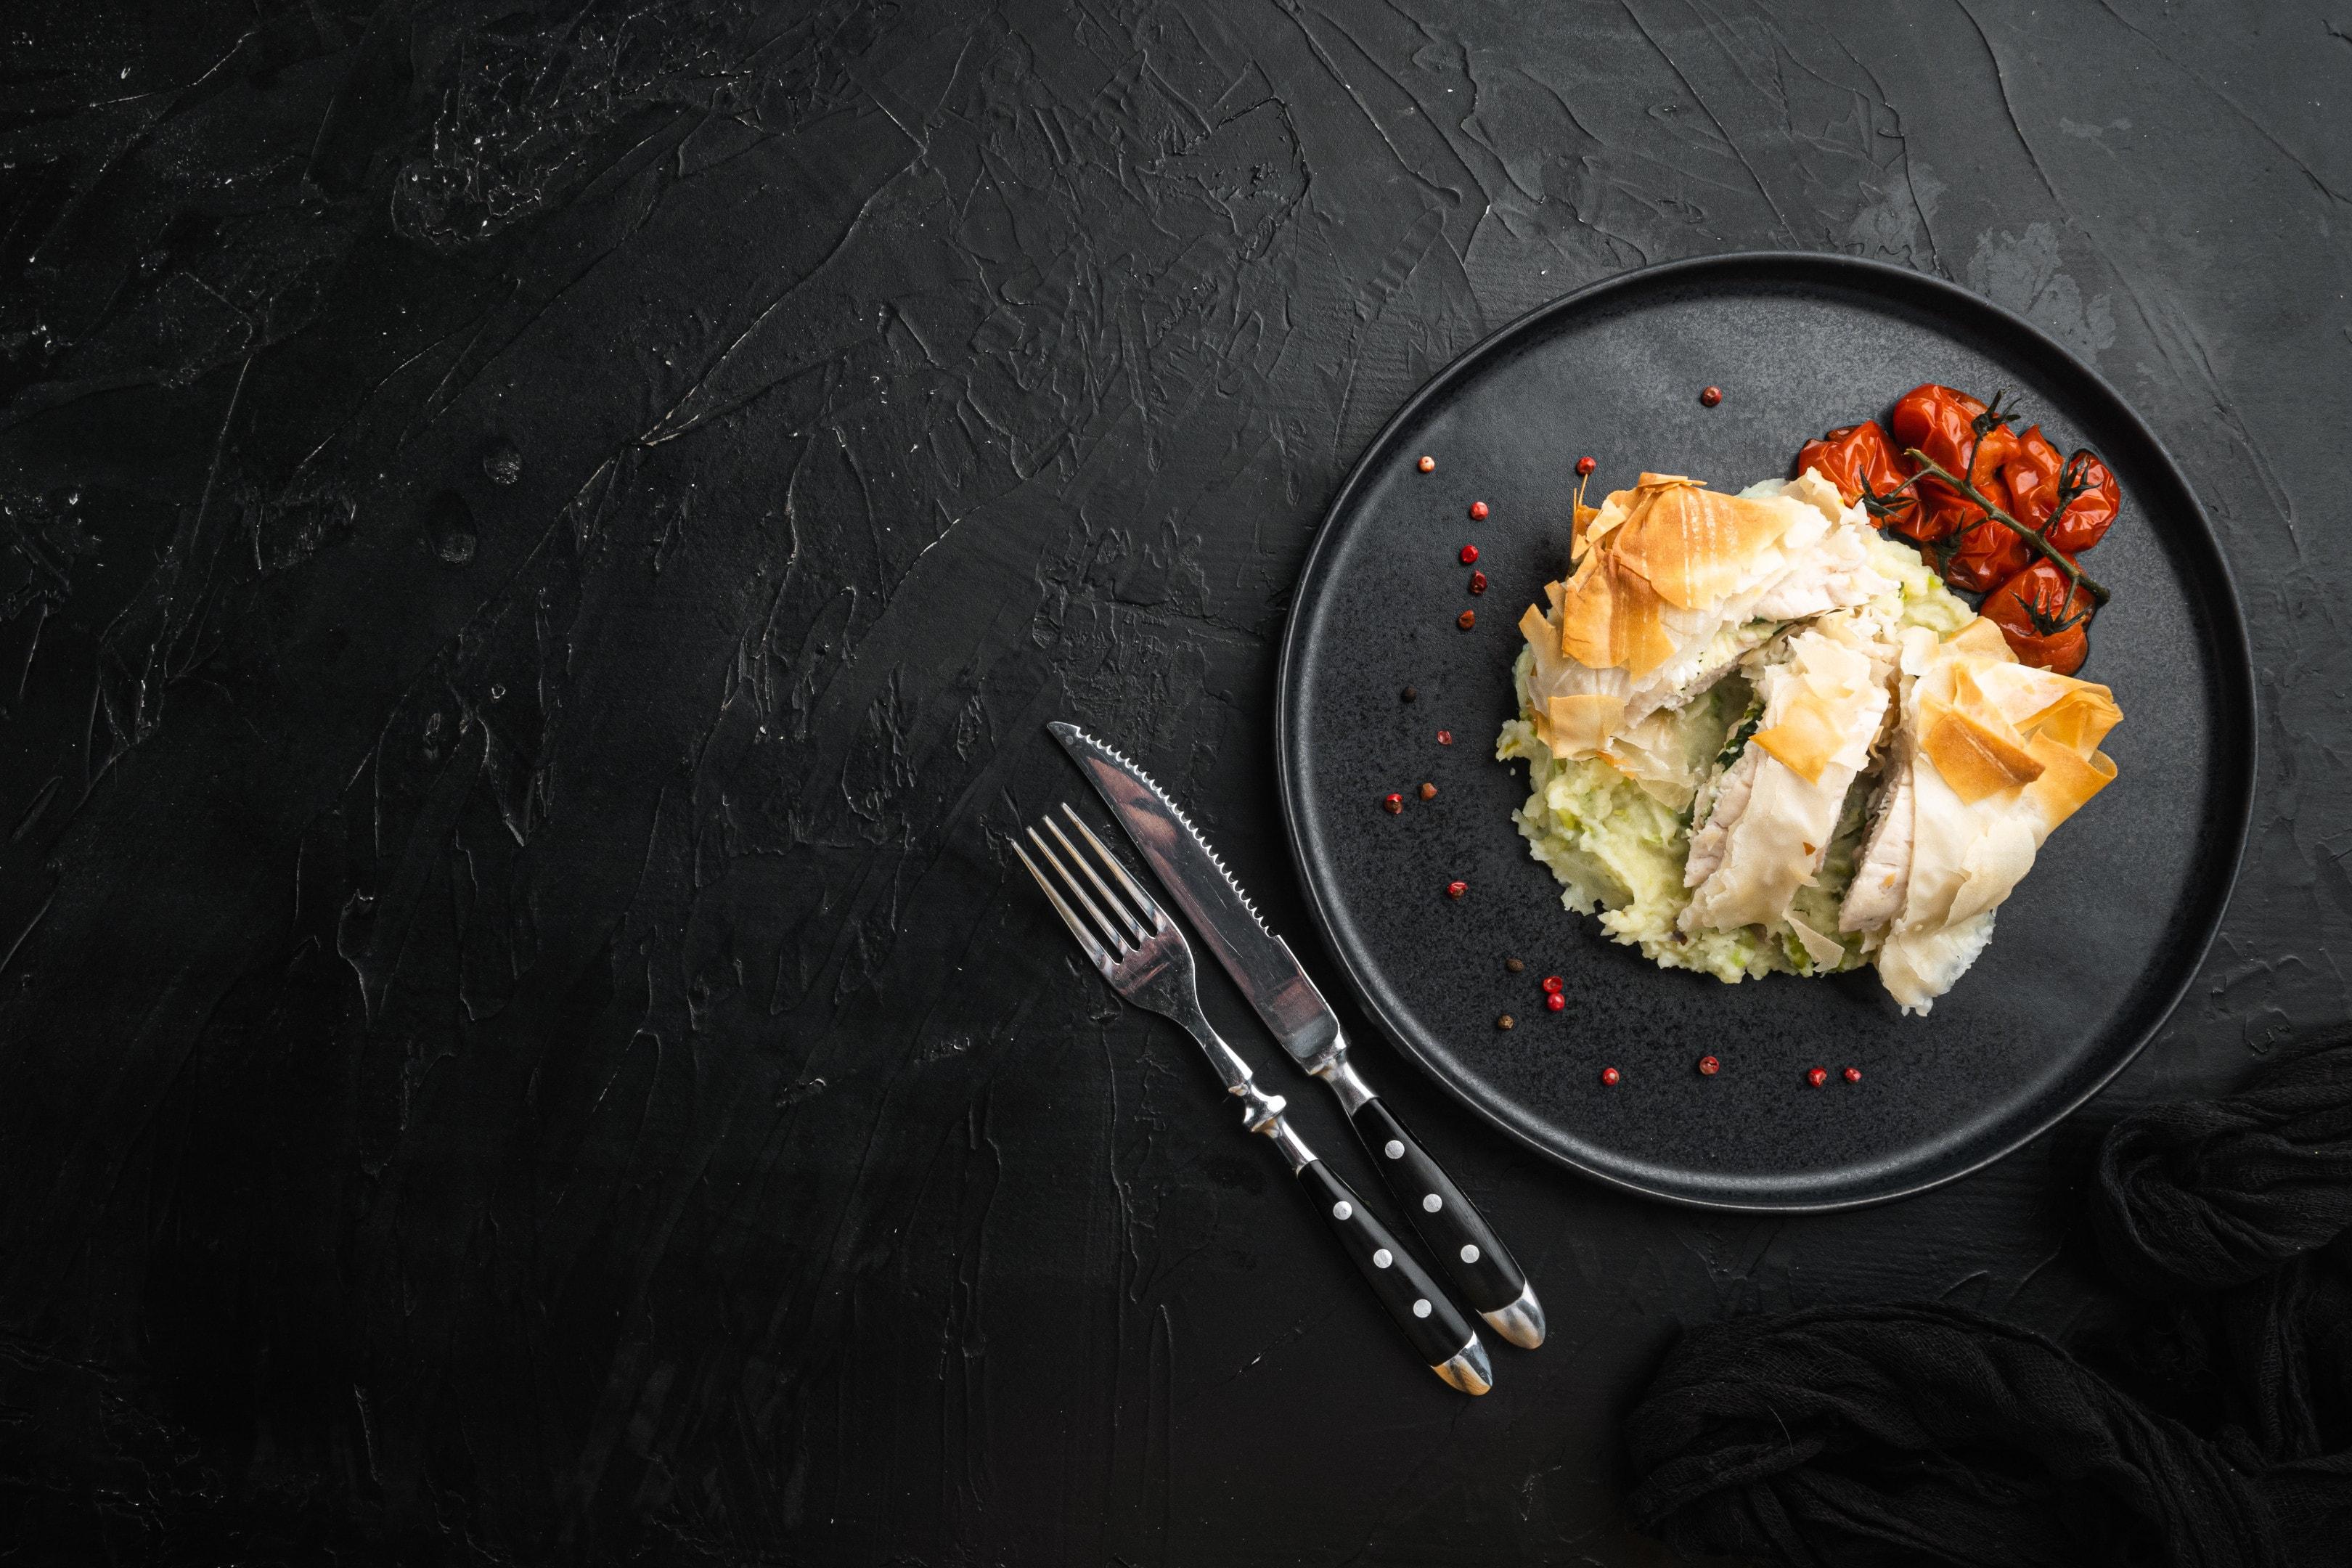 Stuffed chicken cutlets on mashed potatoes — Kiev style